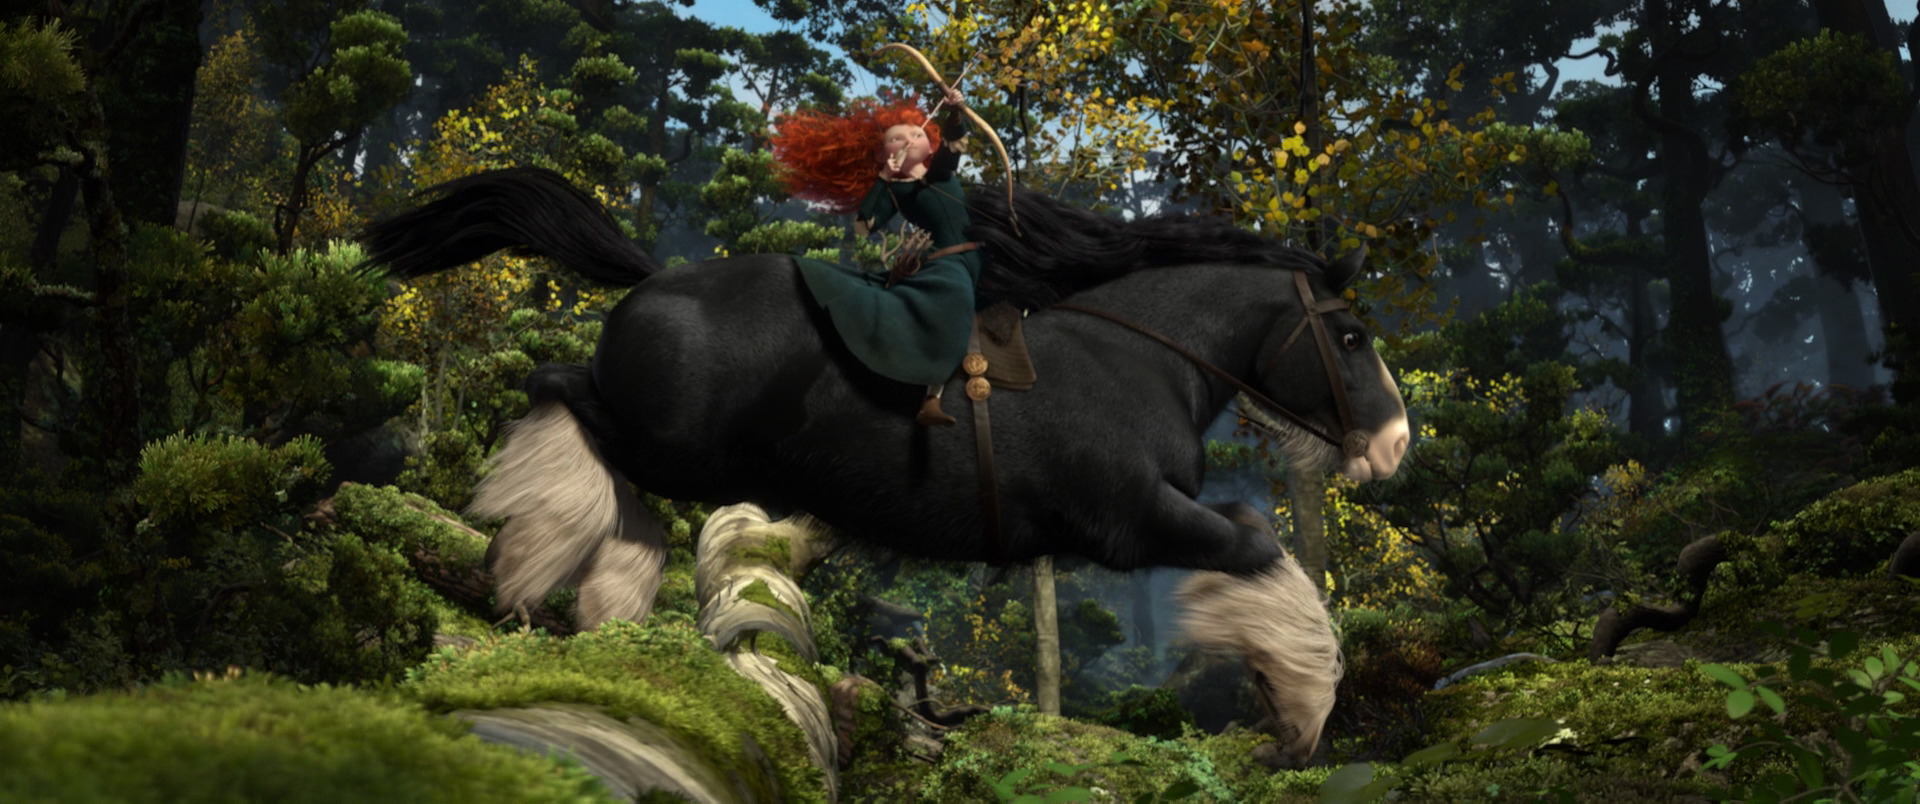 angus pixar disney character rebelle brave